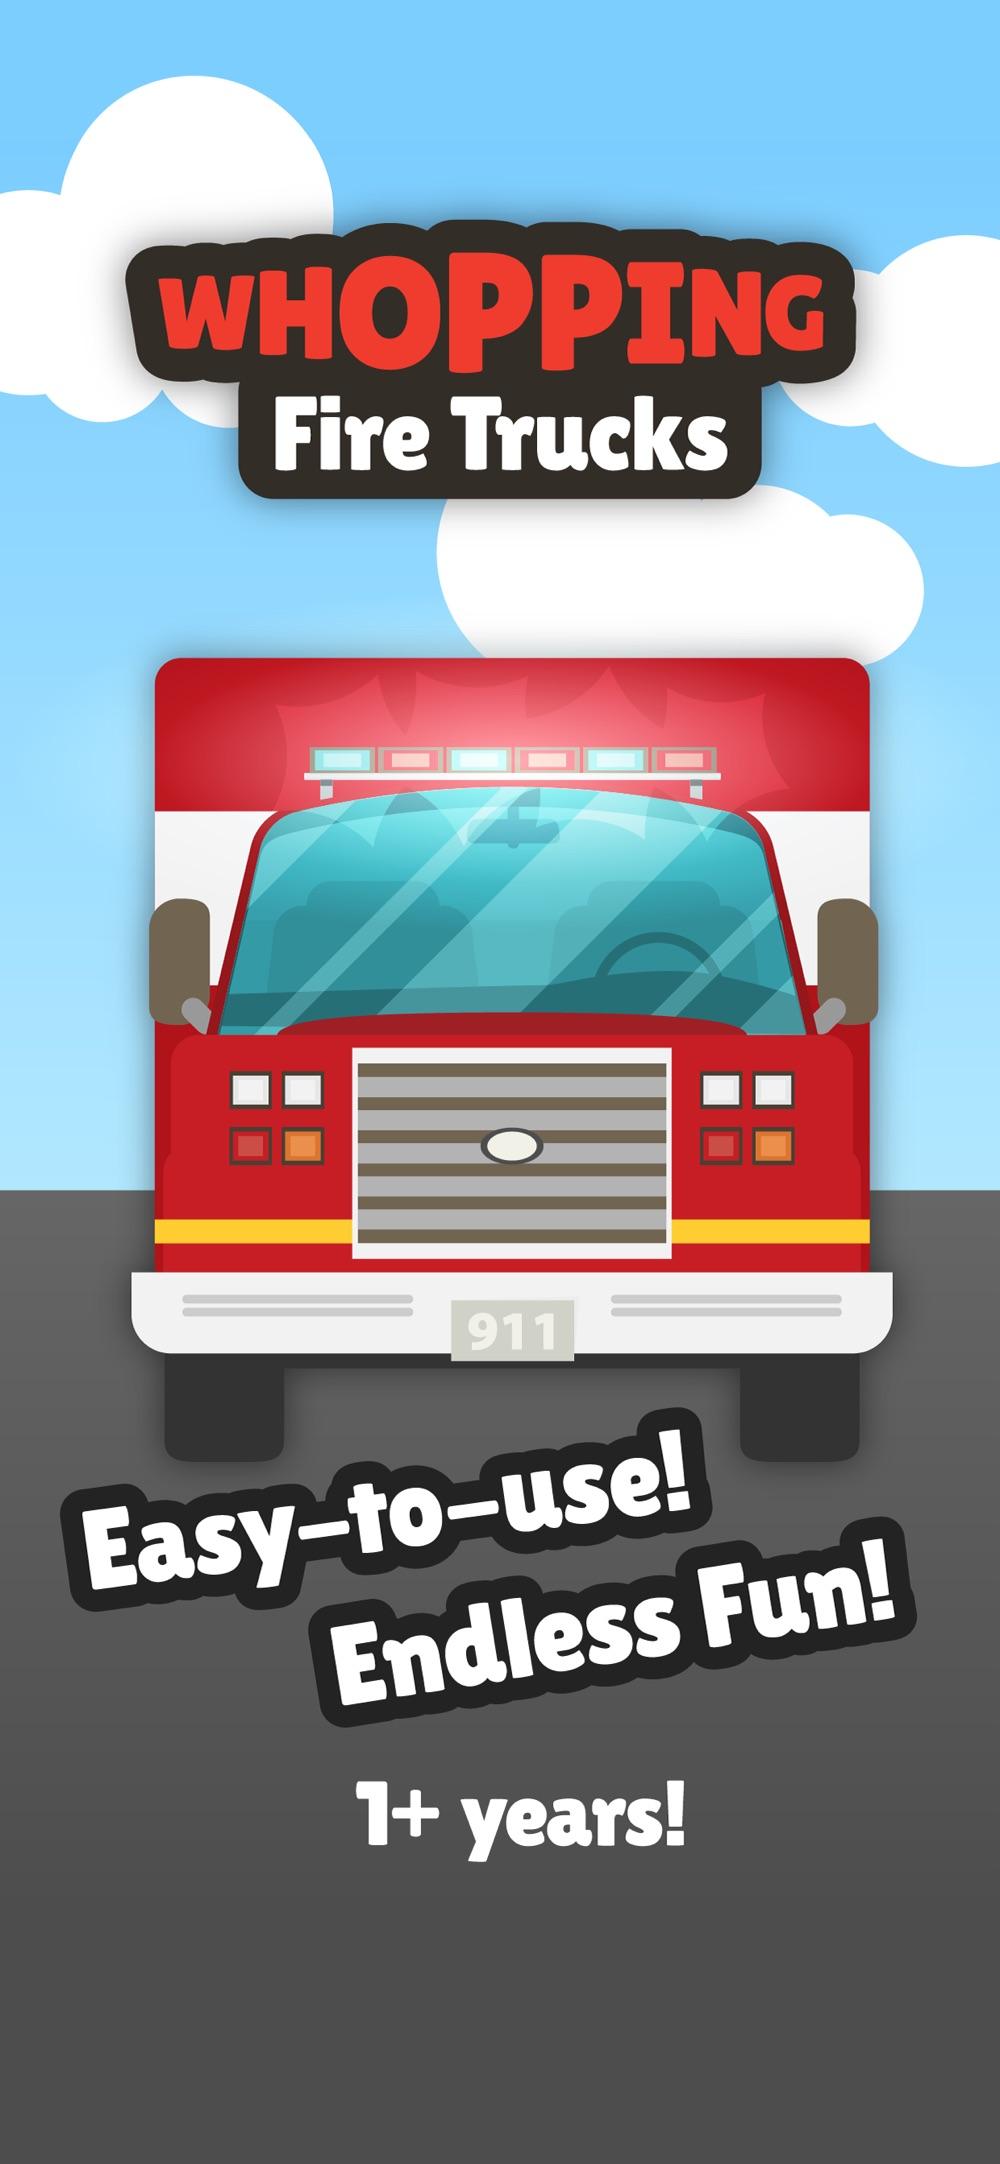 Whopping Fire Trucks Cheat Codes